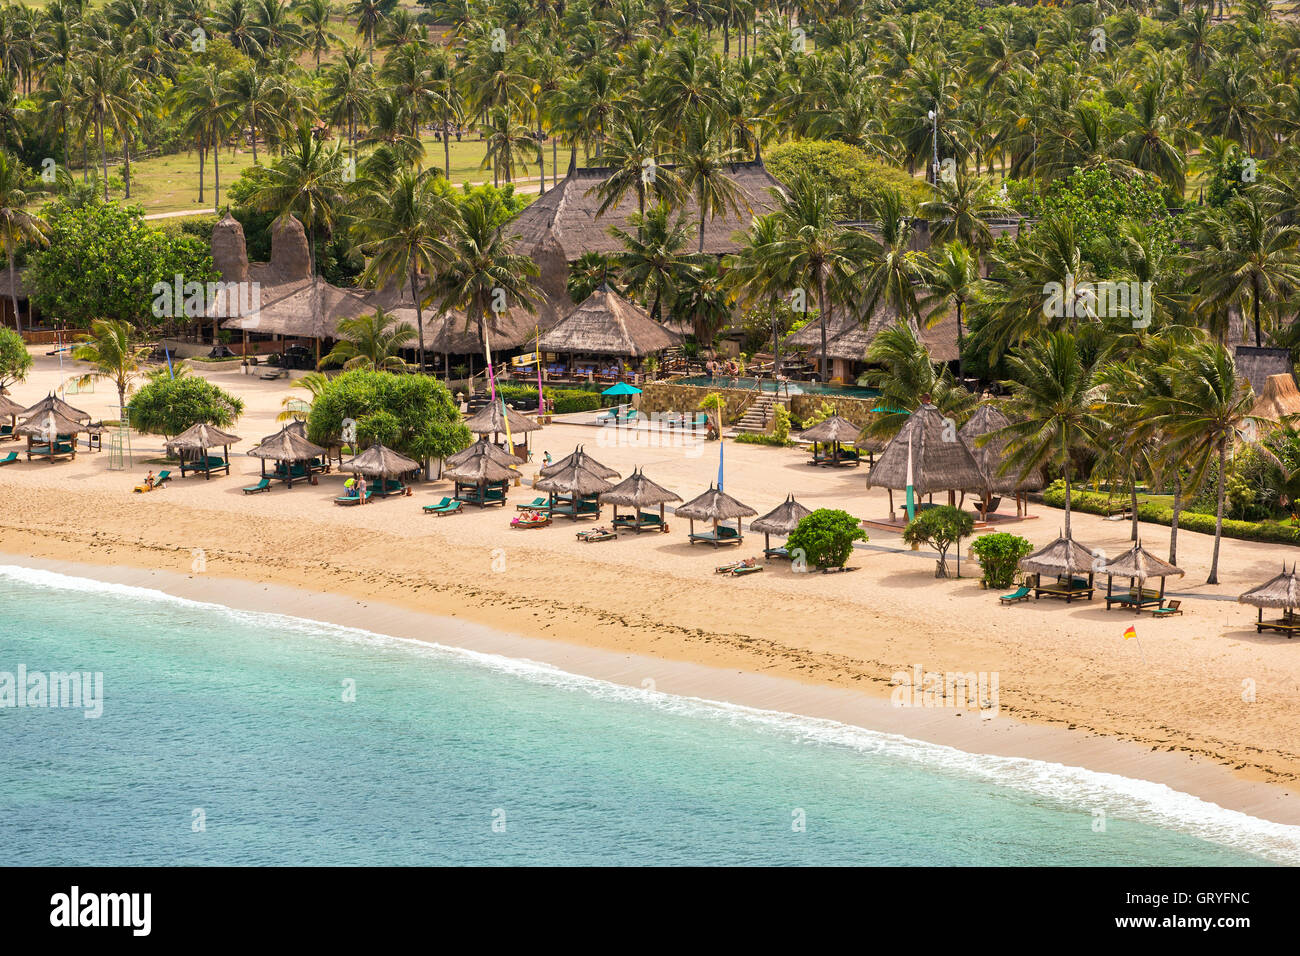 Tropical resort on Kuta sand beach, Lombok, Indonesia - Stock Image